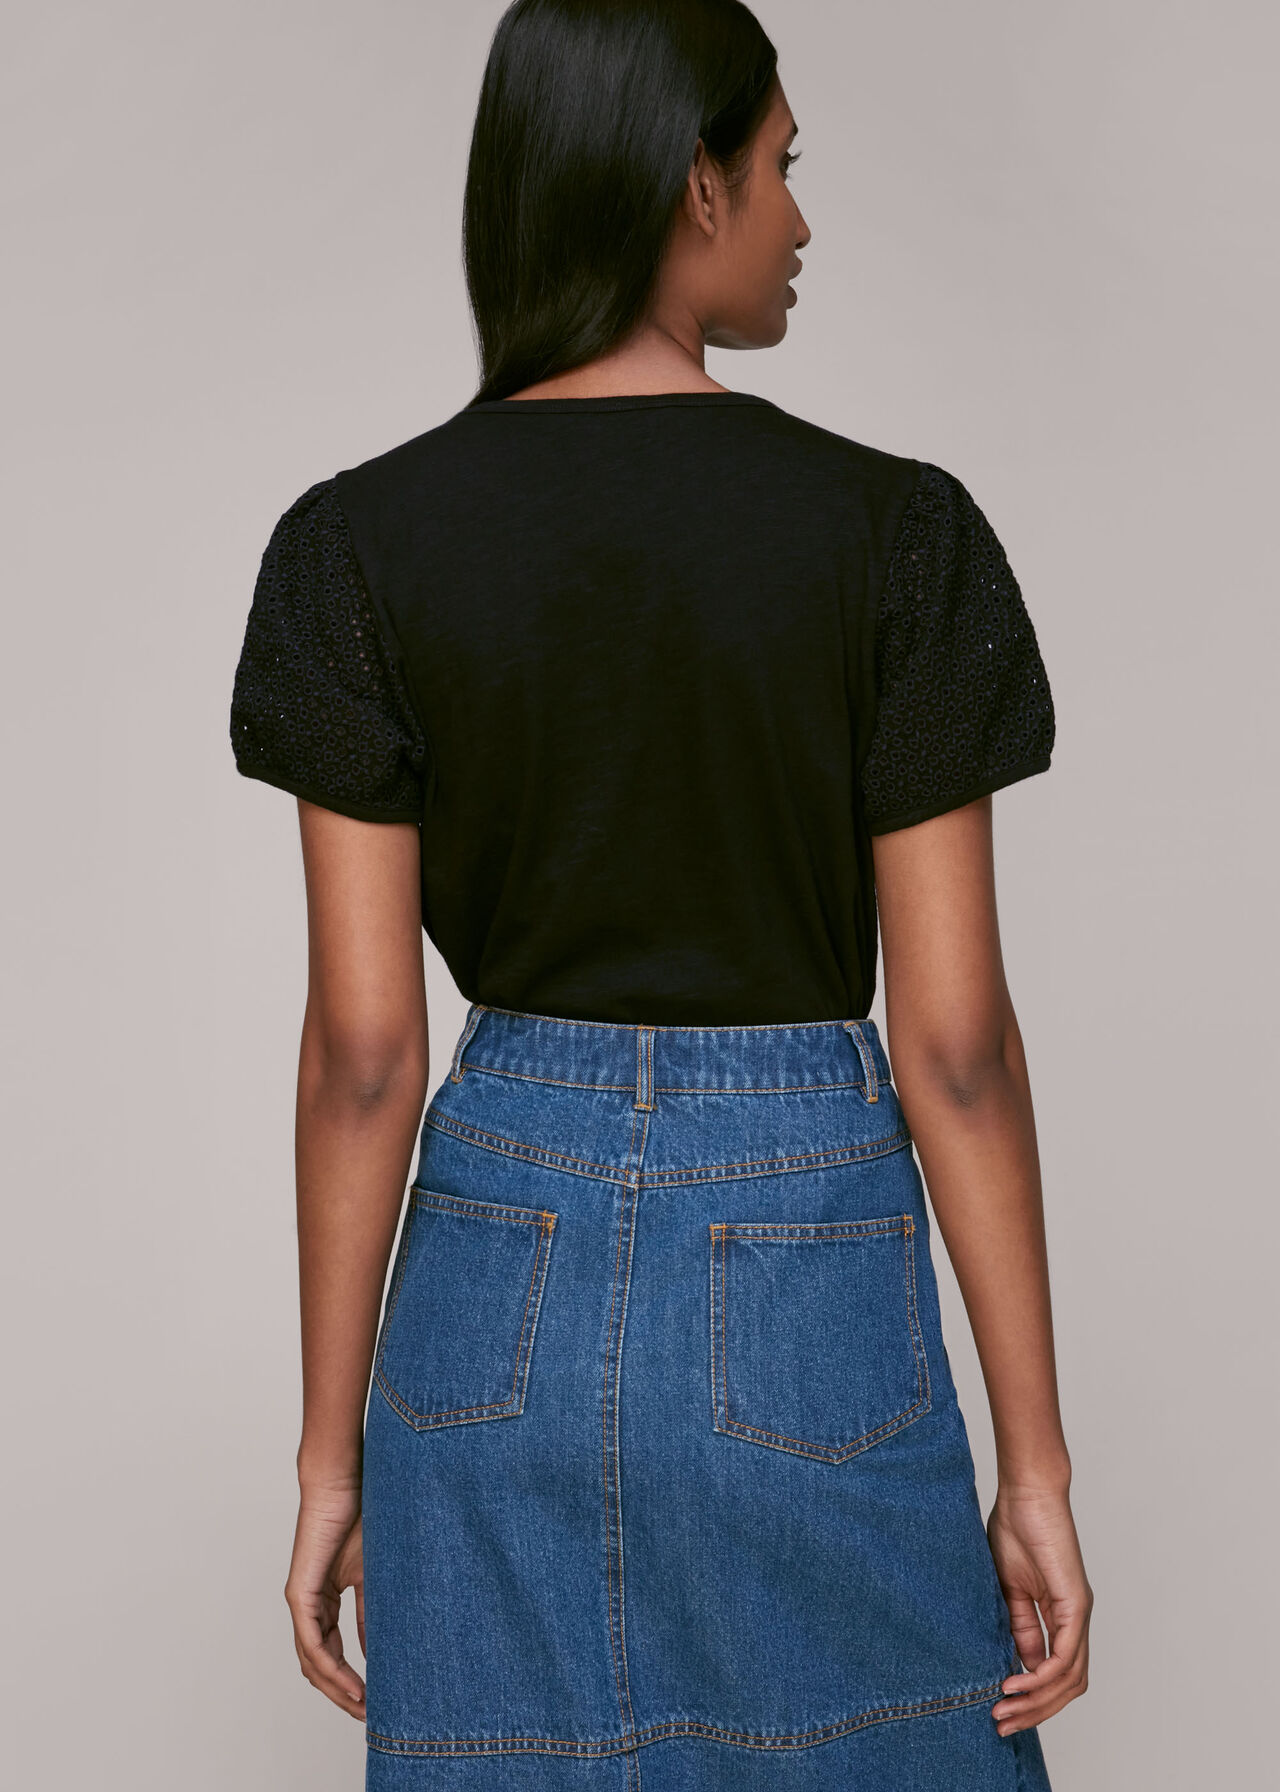 Broderie Puff Sleeve T-Shirt Black